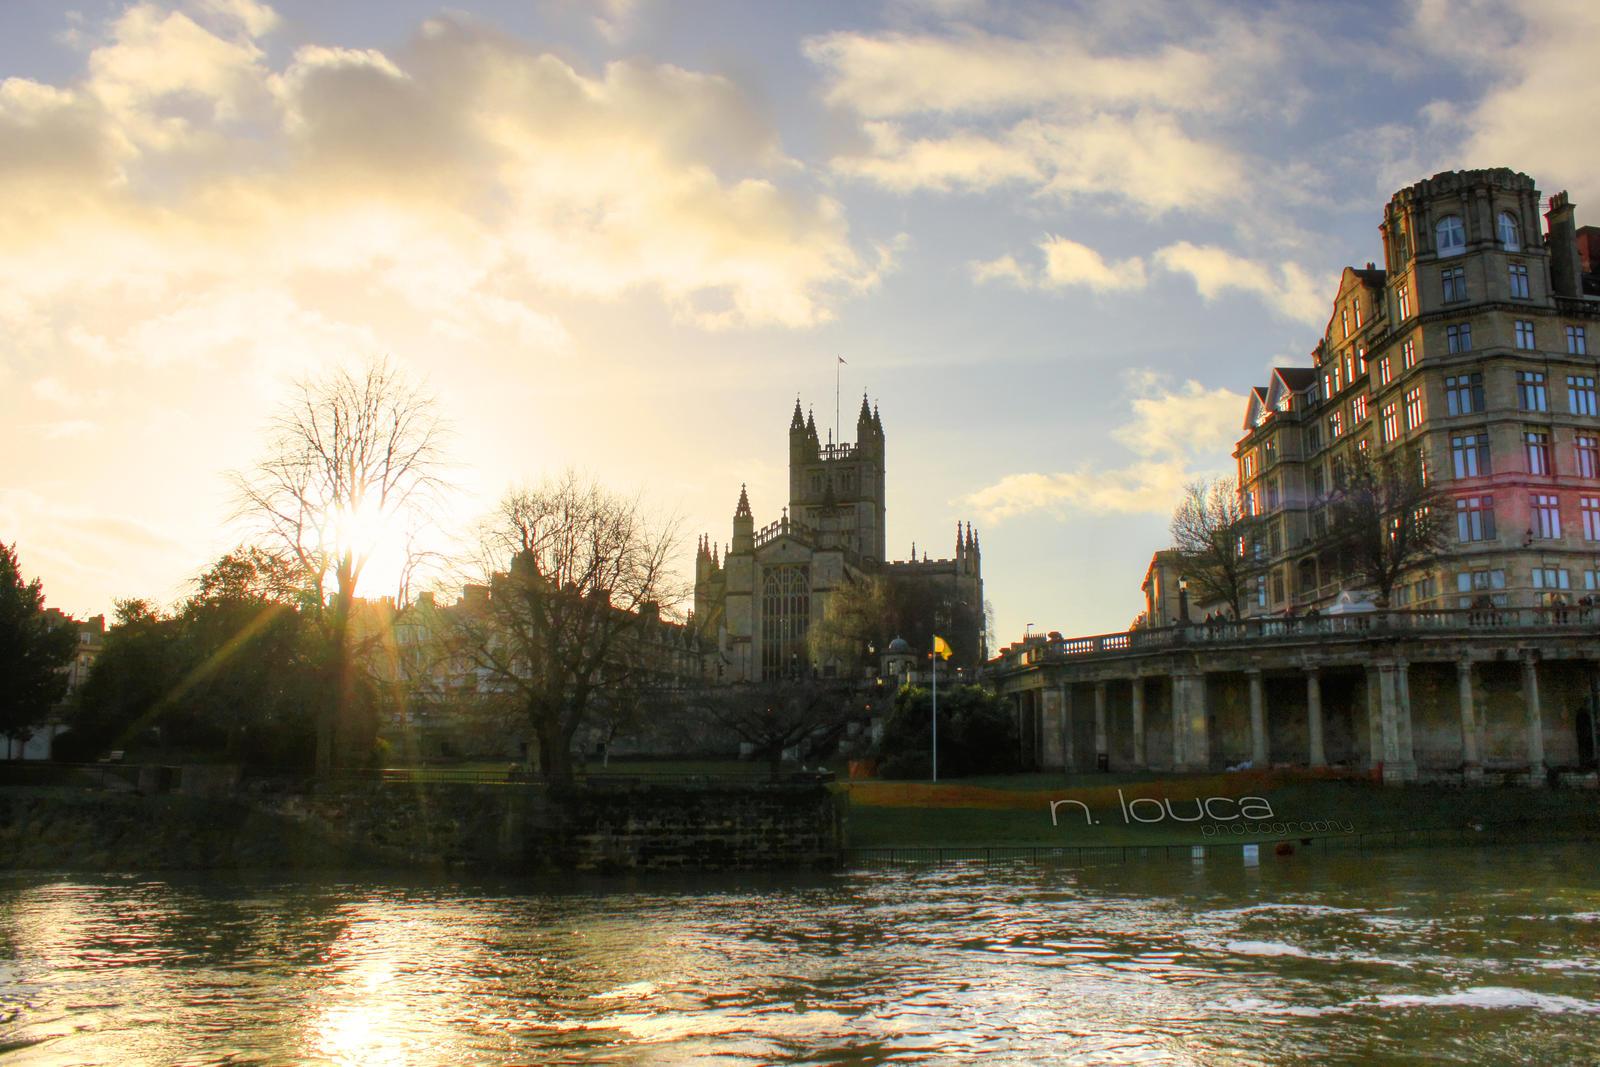 Sun Bath - Bath Abbey / River Avon, Bath, UK by DemonOfRazgriz323